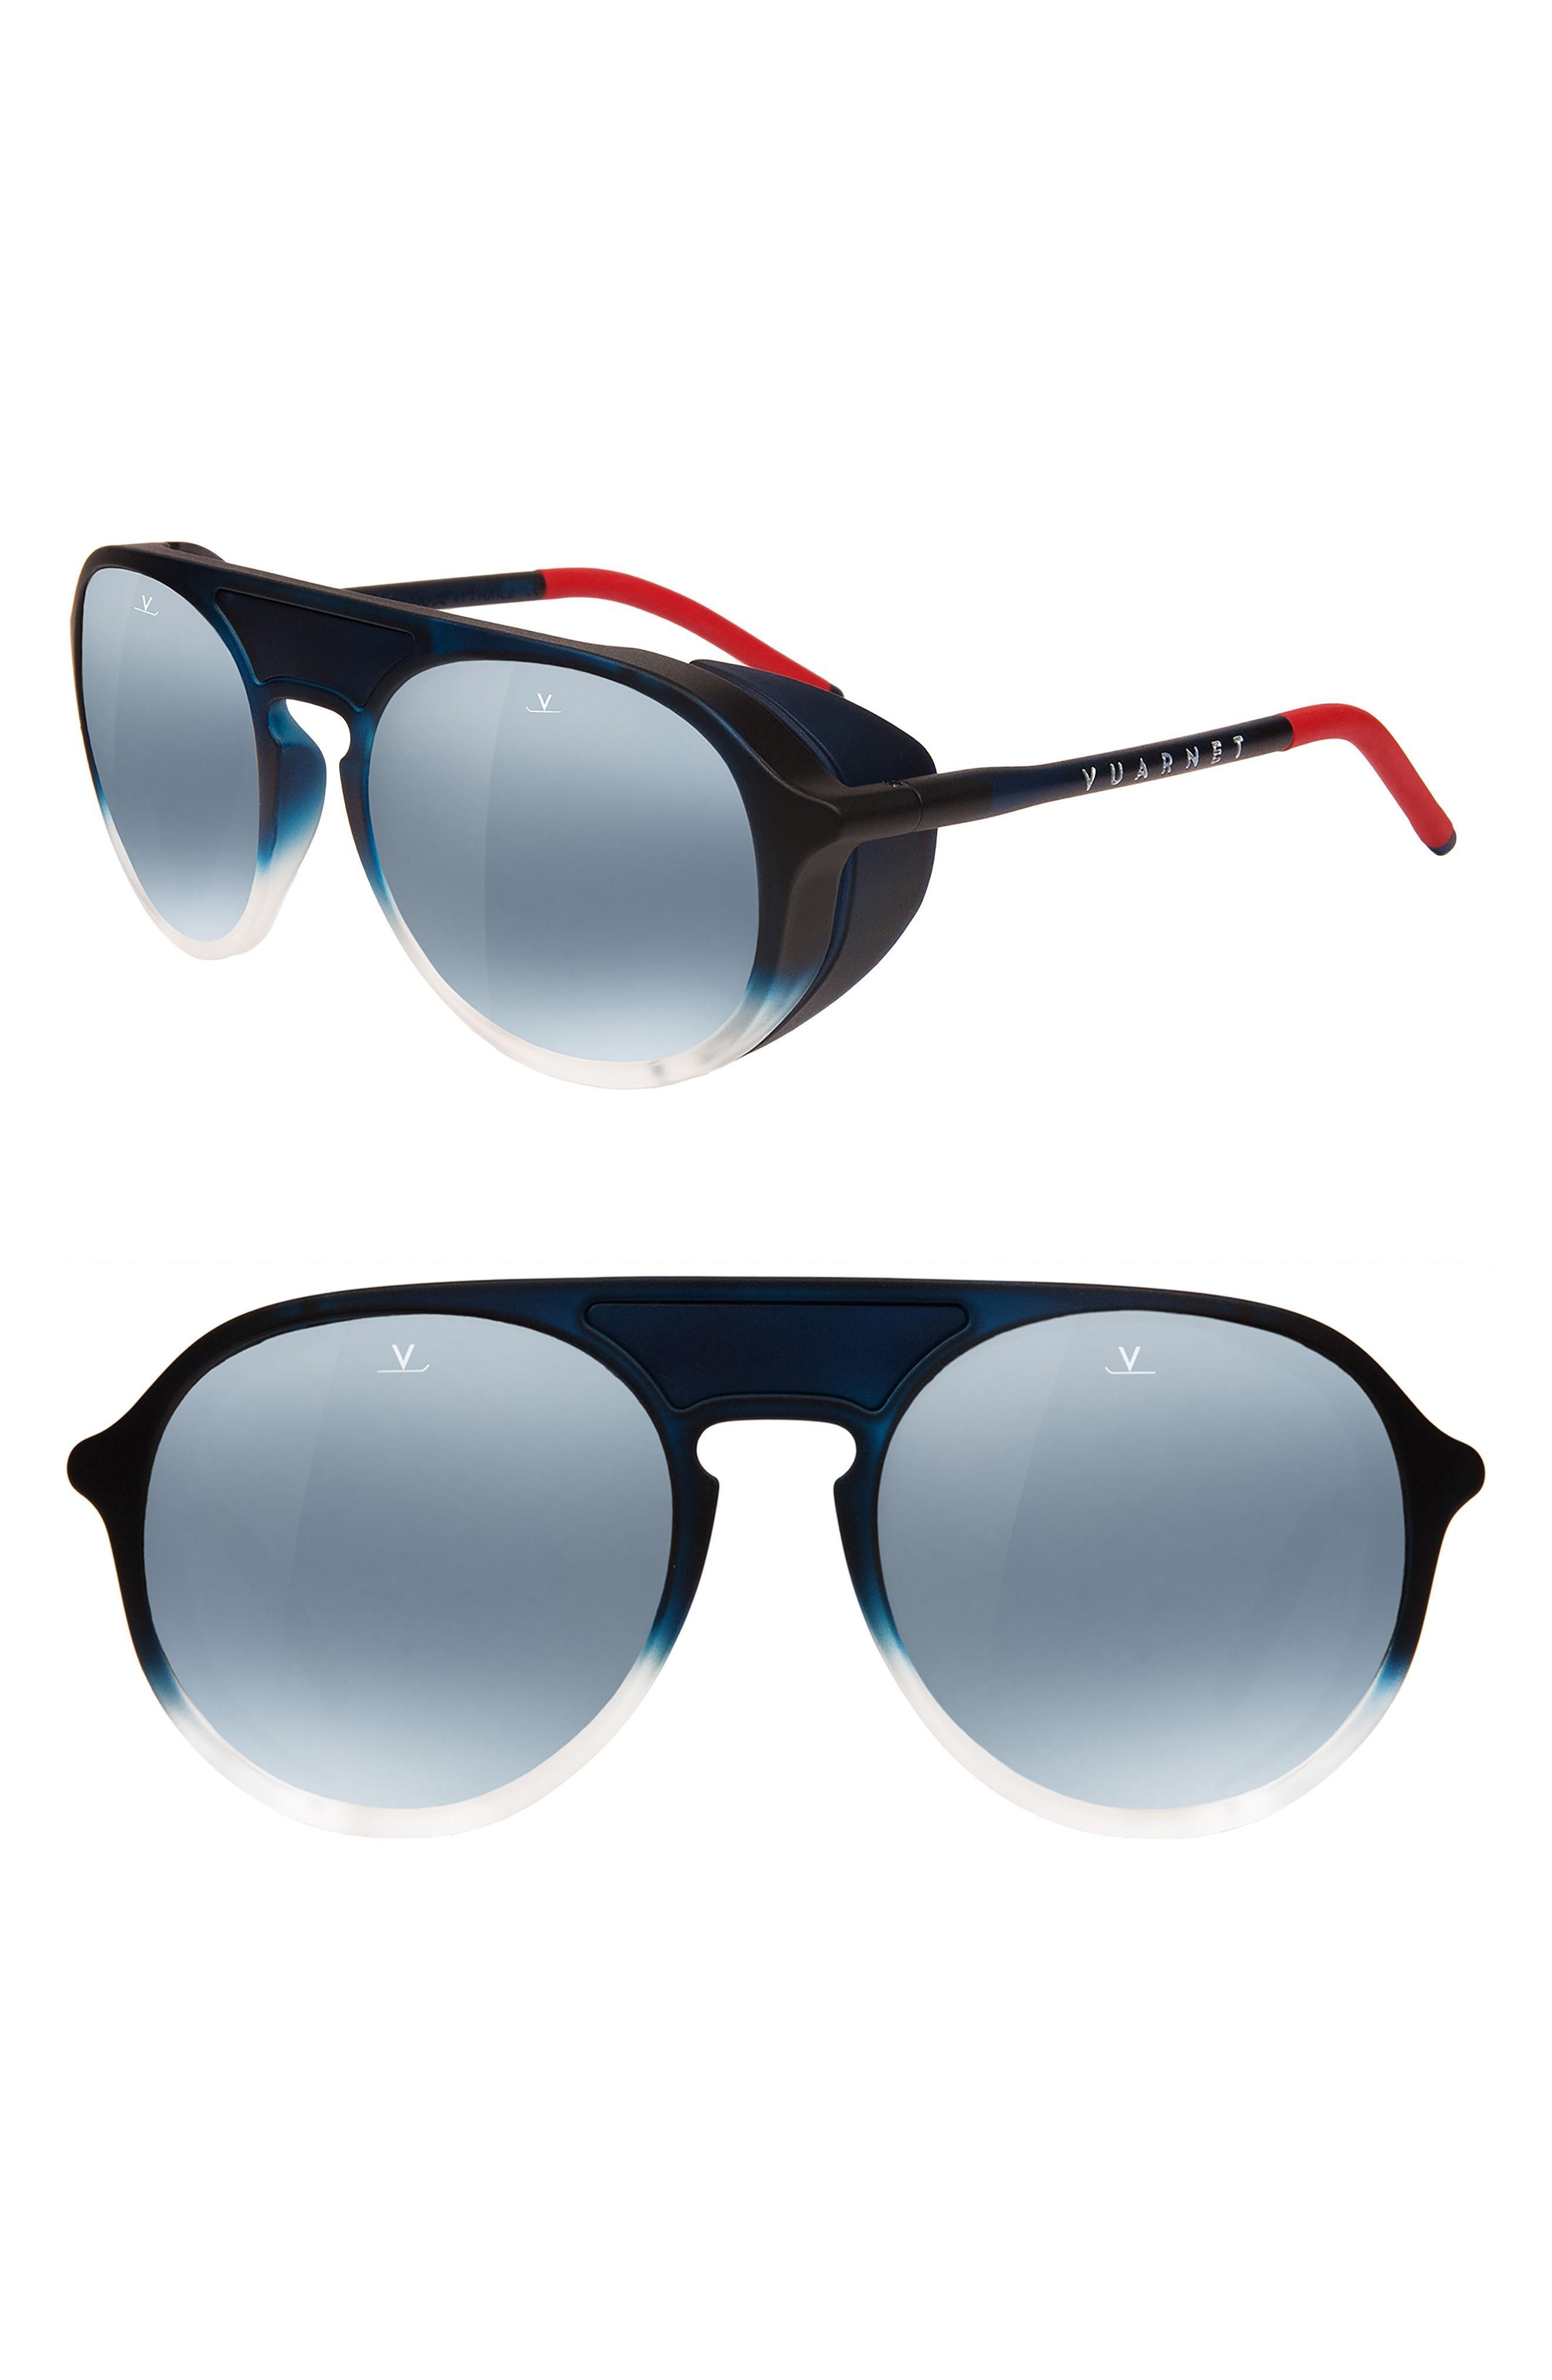 fc4c46f99621 Vuarnet Ice 51Mm Polarized Aviator Sunglasses - Blue Polarlynx ...